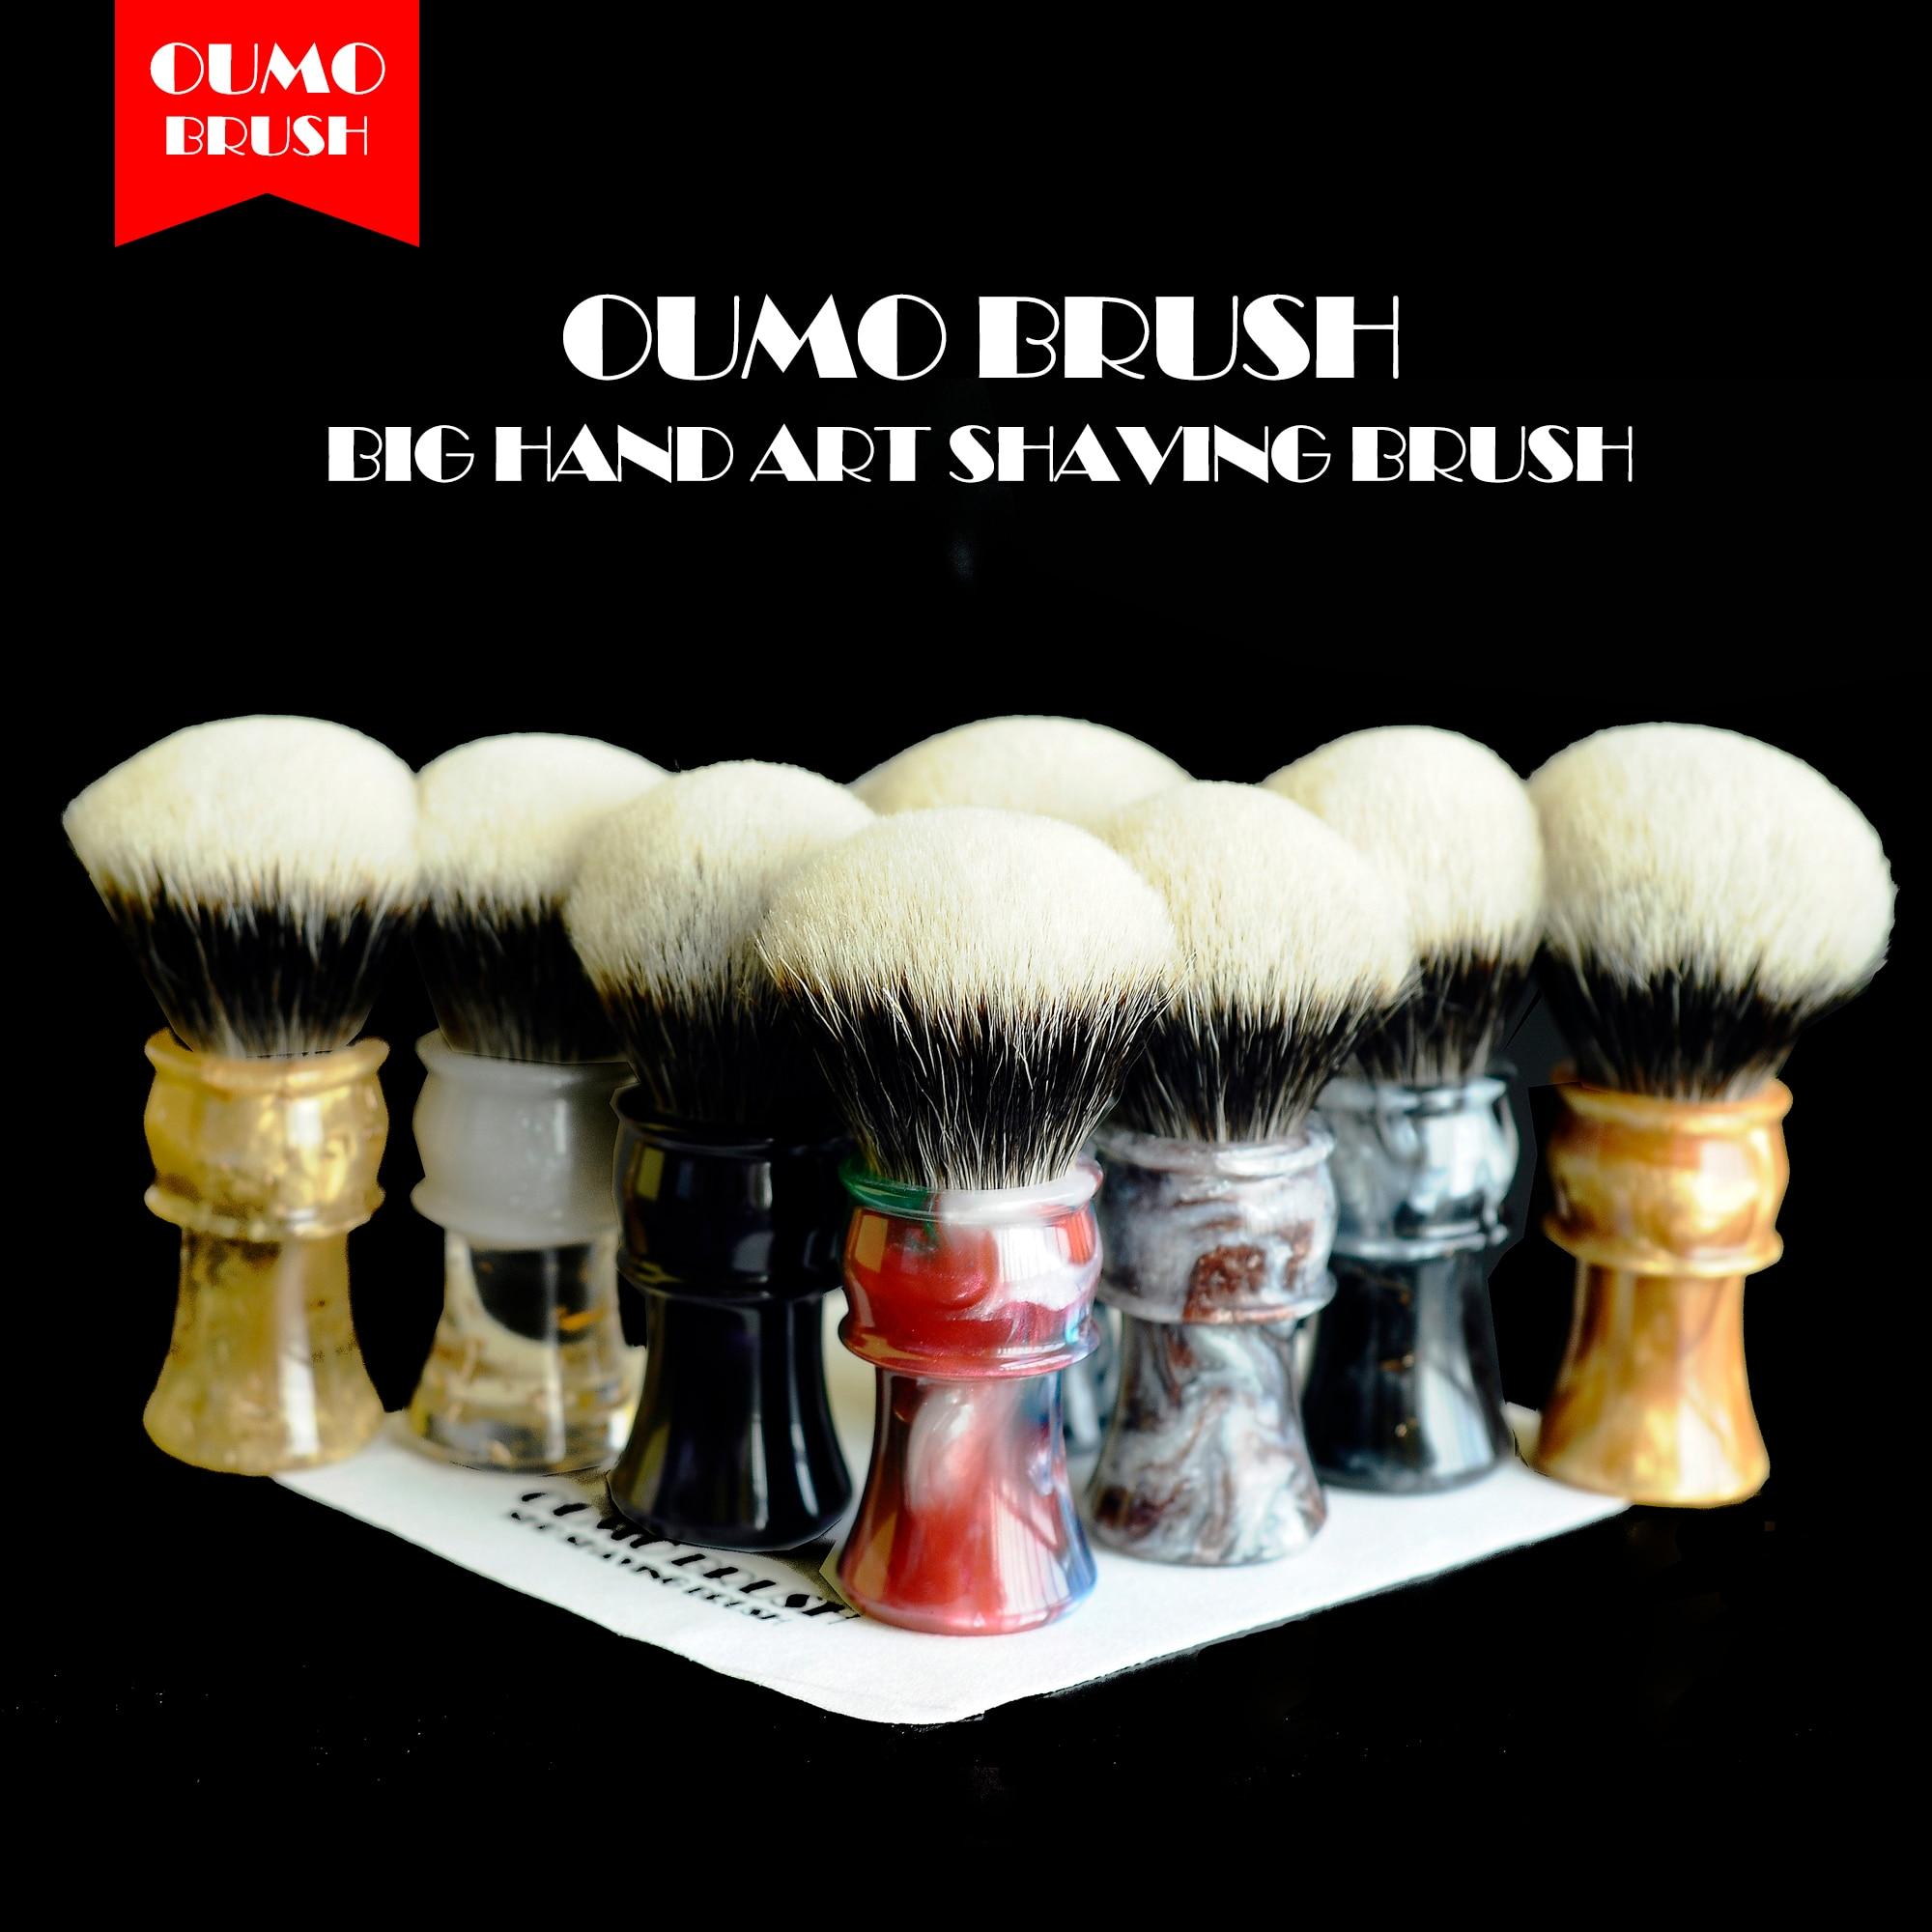 OUMO BRUSH-2019/8/1 Big Handle Art Shaving Brush Fan SHD Manchuria Finest Badger Knot Gel City